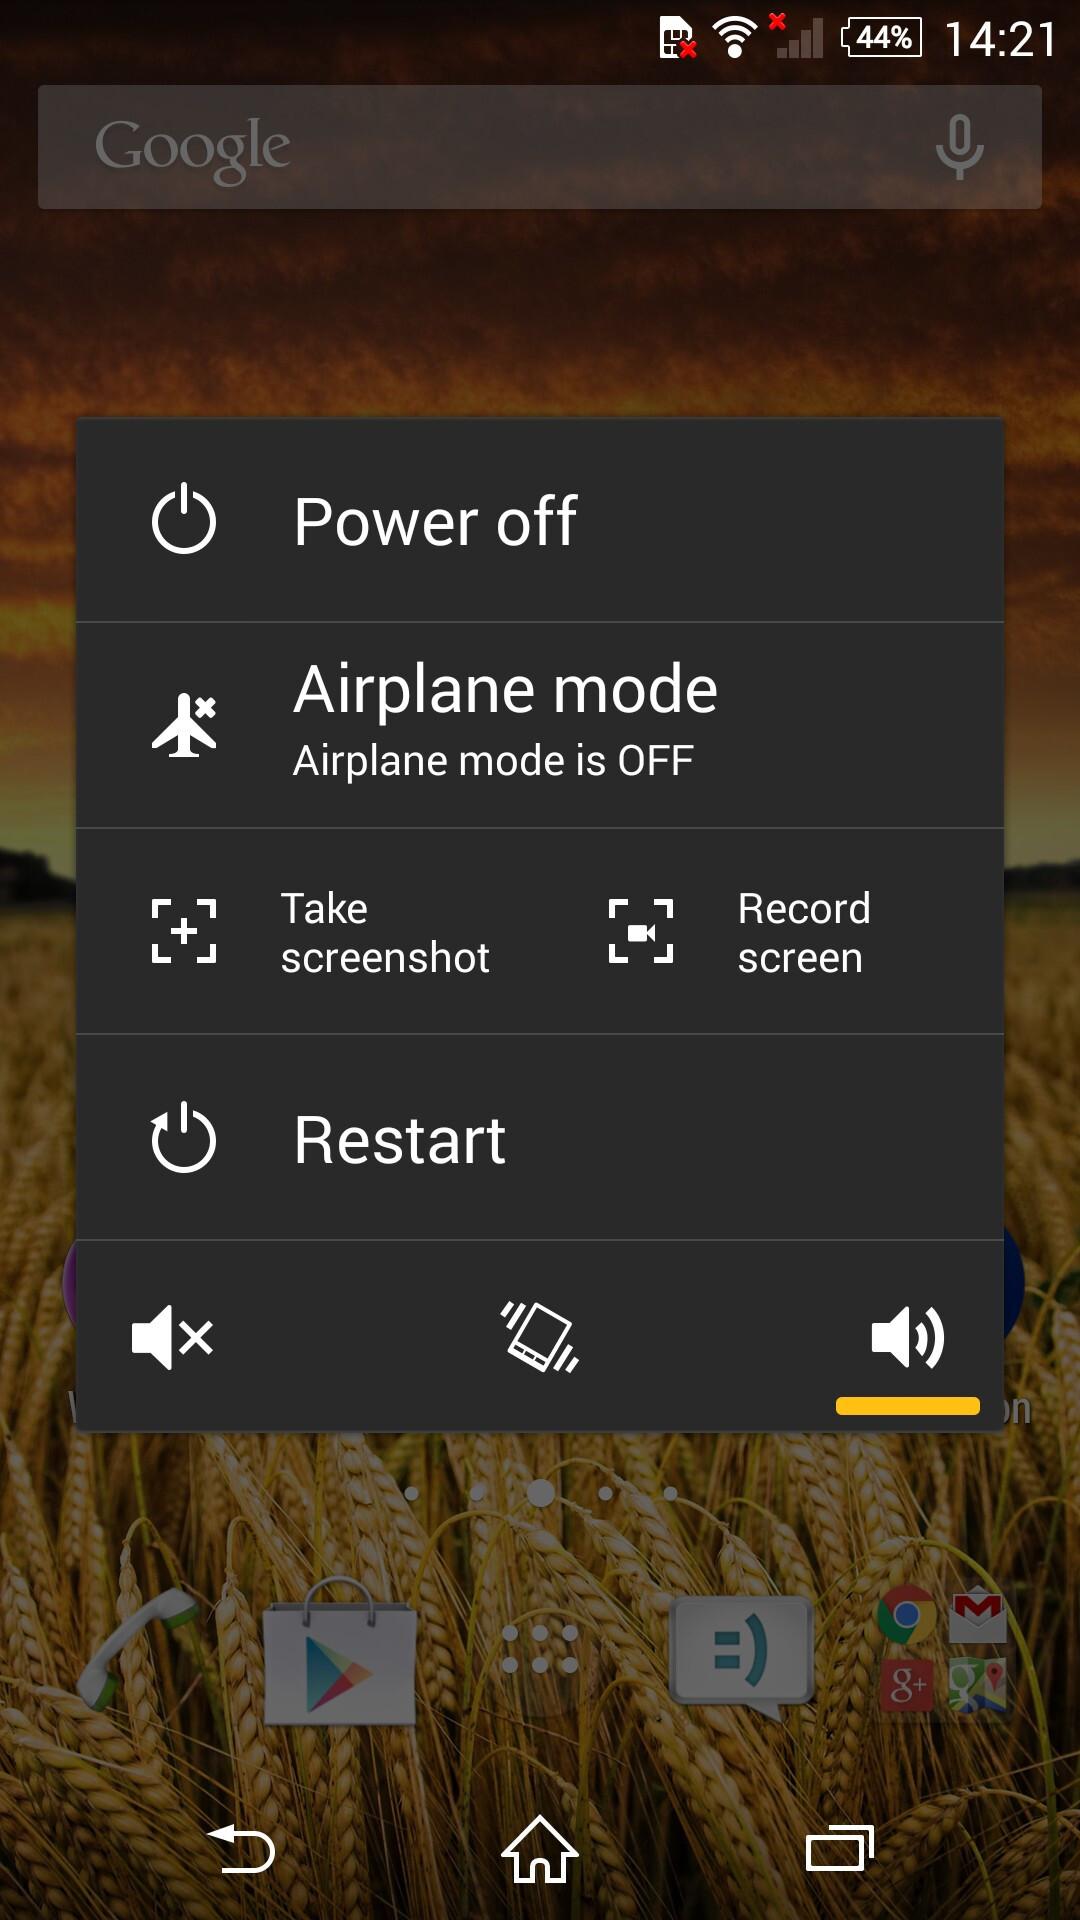 Как сделать снимок экрана (скриншот) Sony Xperia. (Три) 75